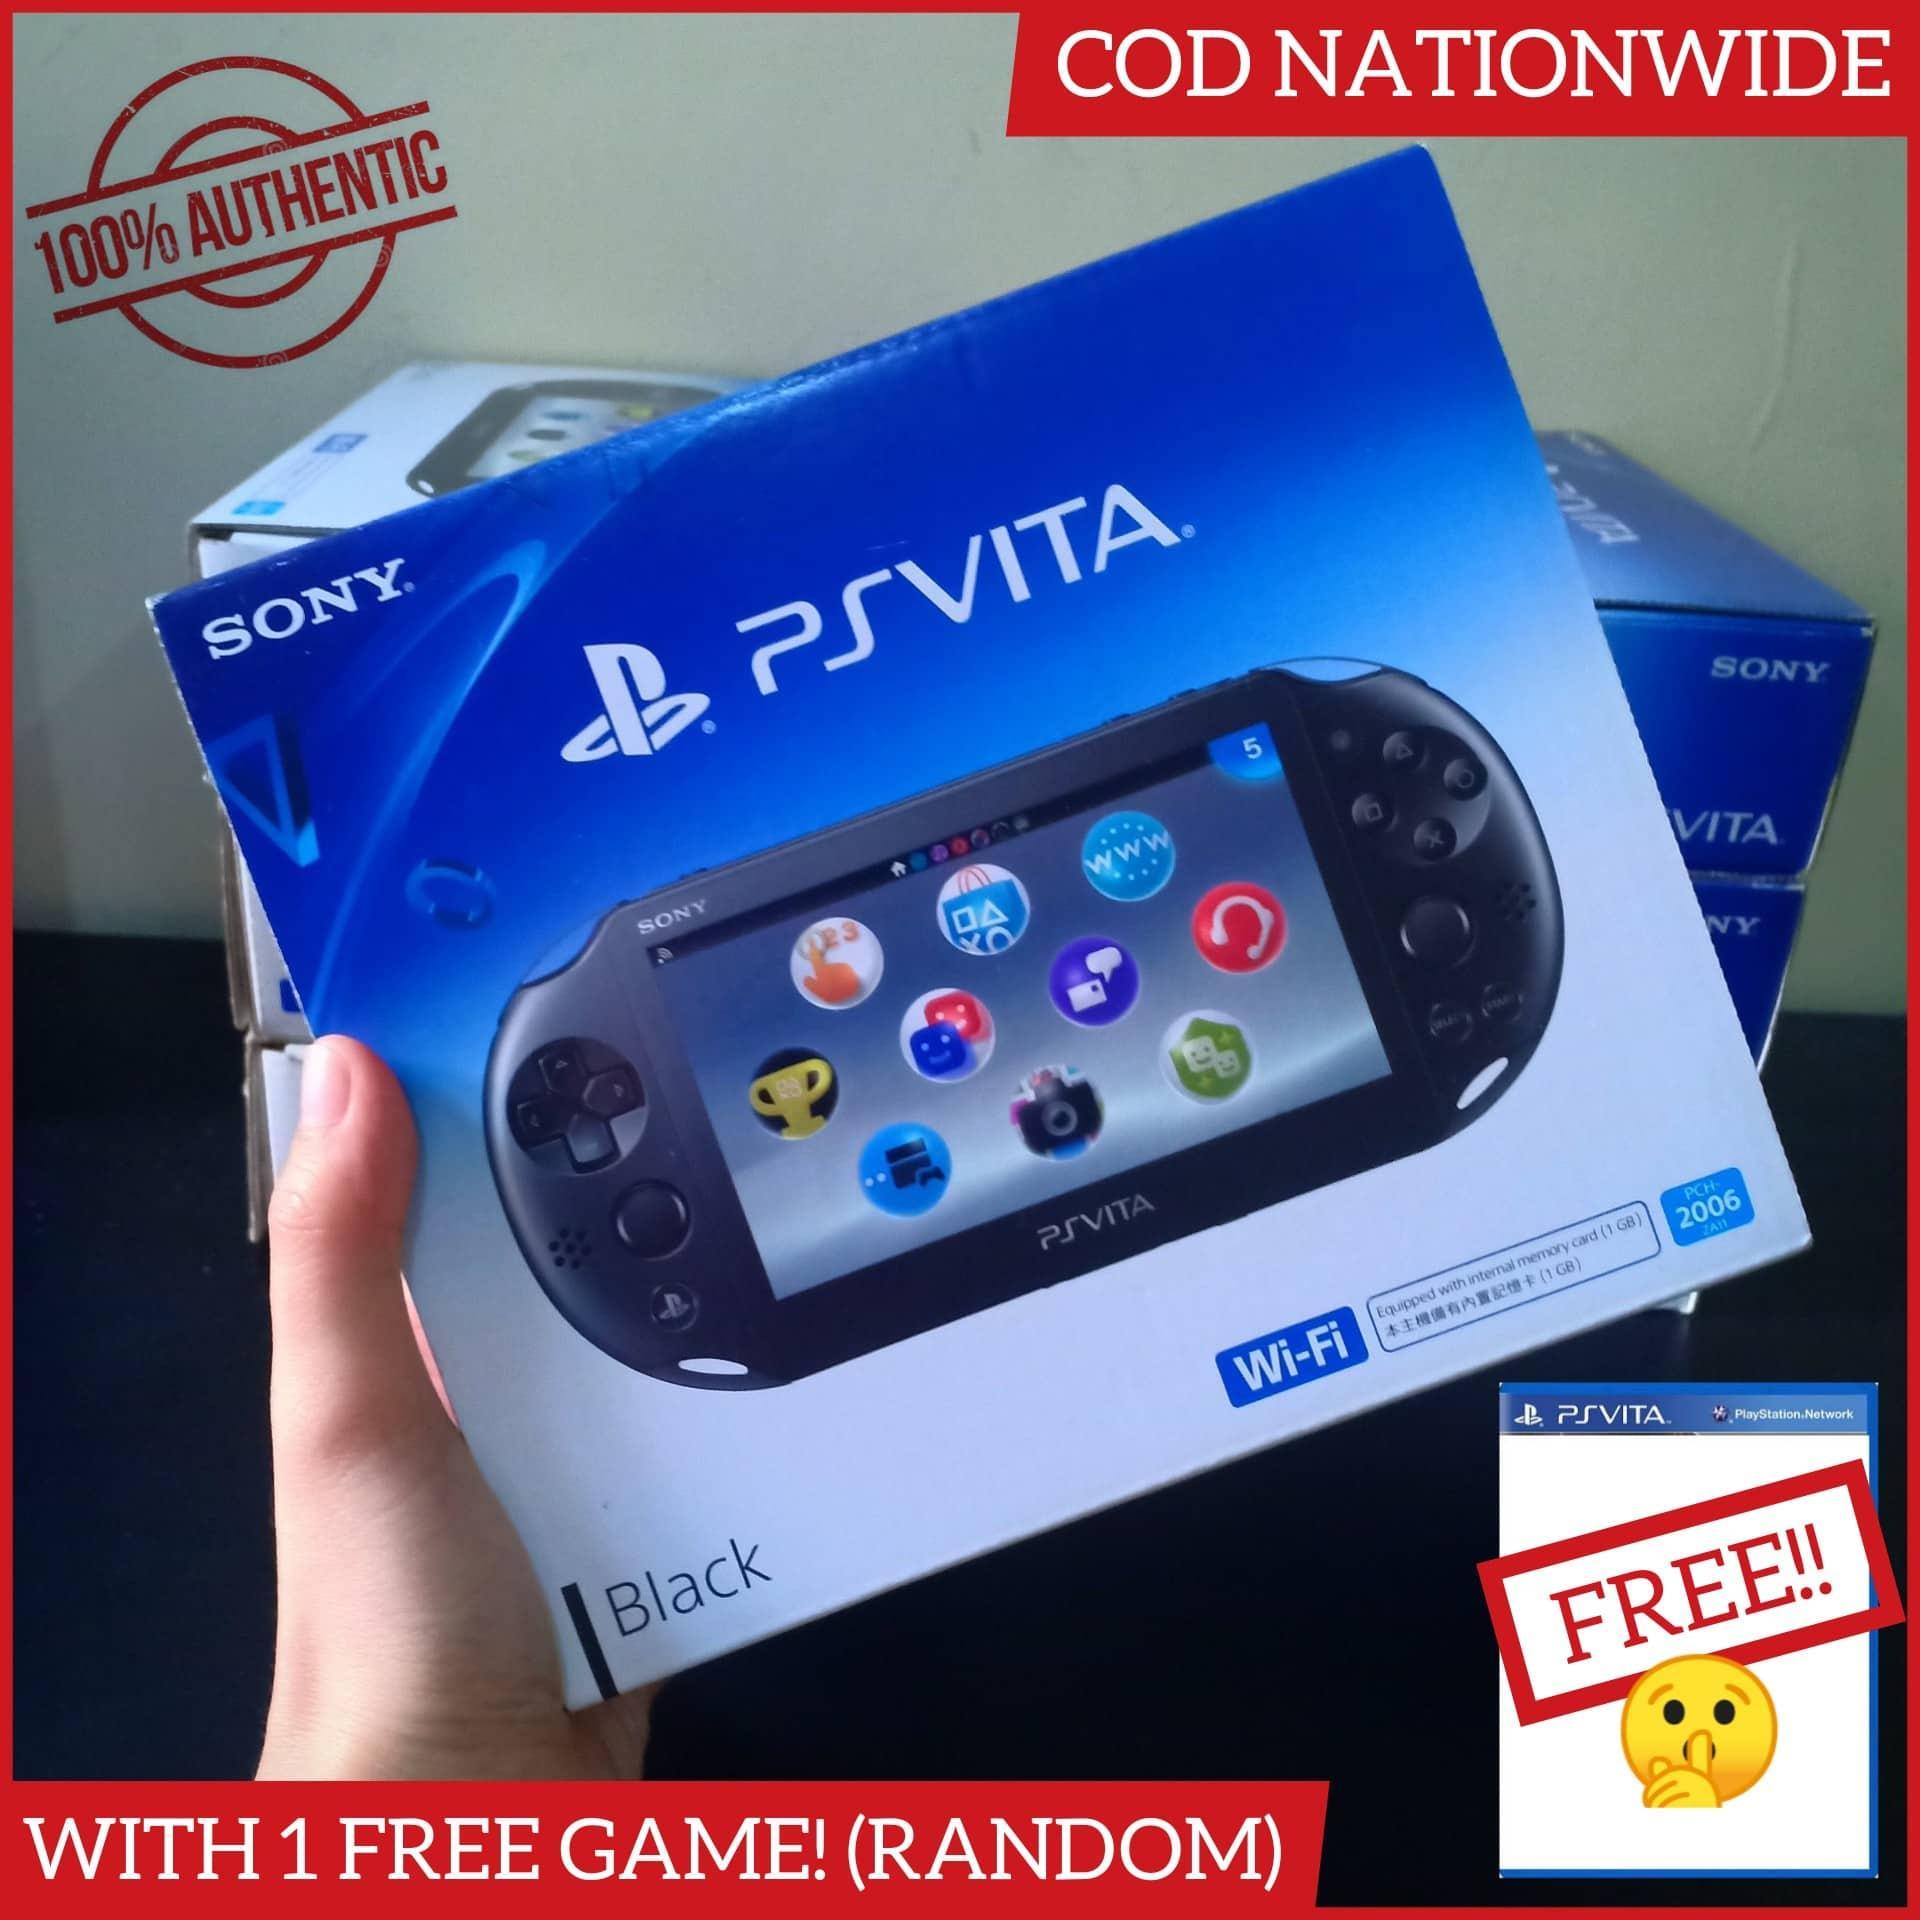 Brandnew PS Vita Slim Black Wifi Model with Warranty Latest Version  (Complete)